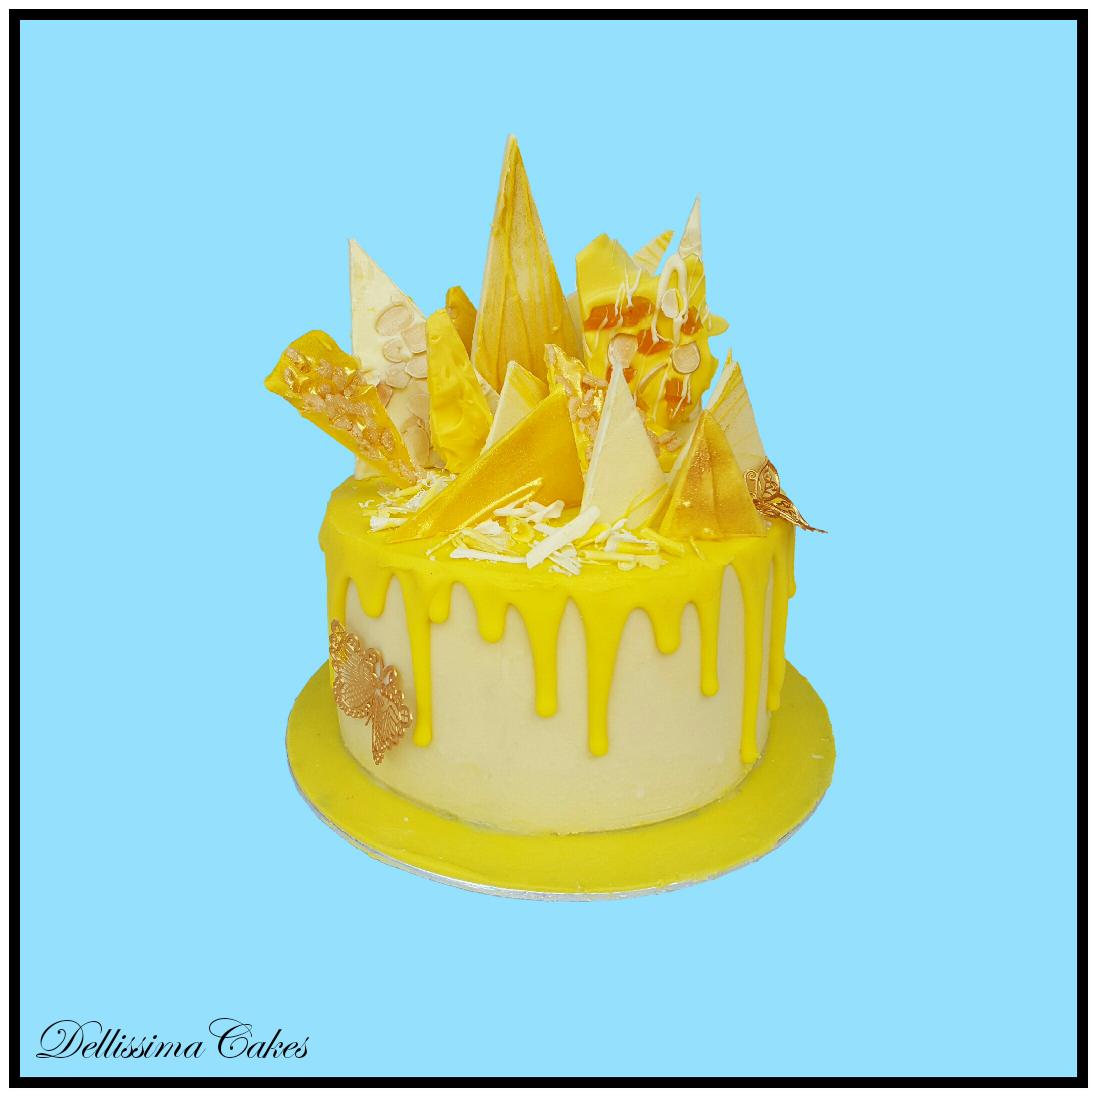 A tasty Lemon Drizzle cake